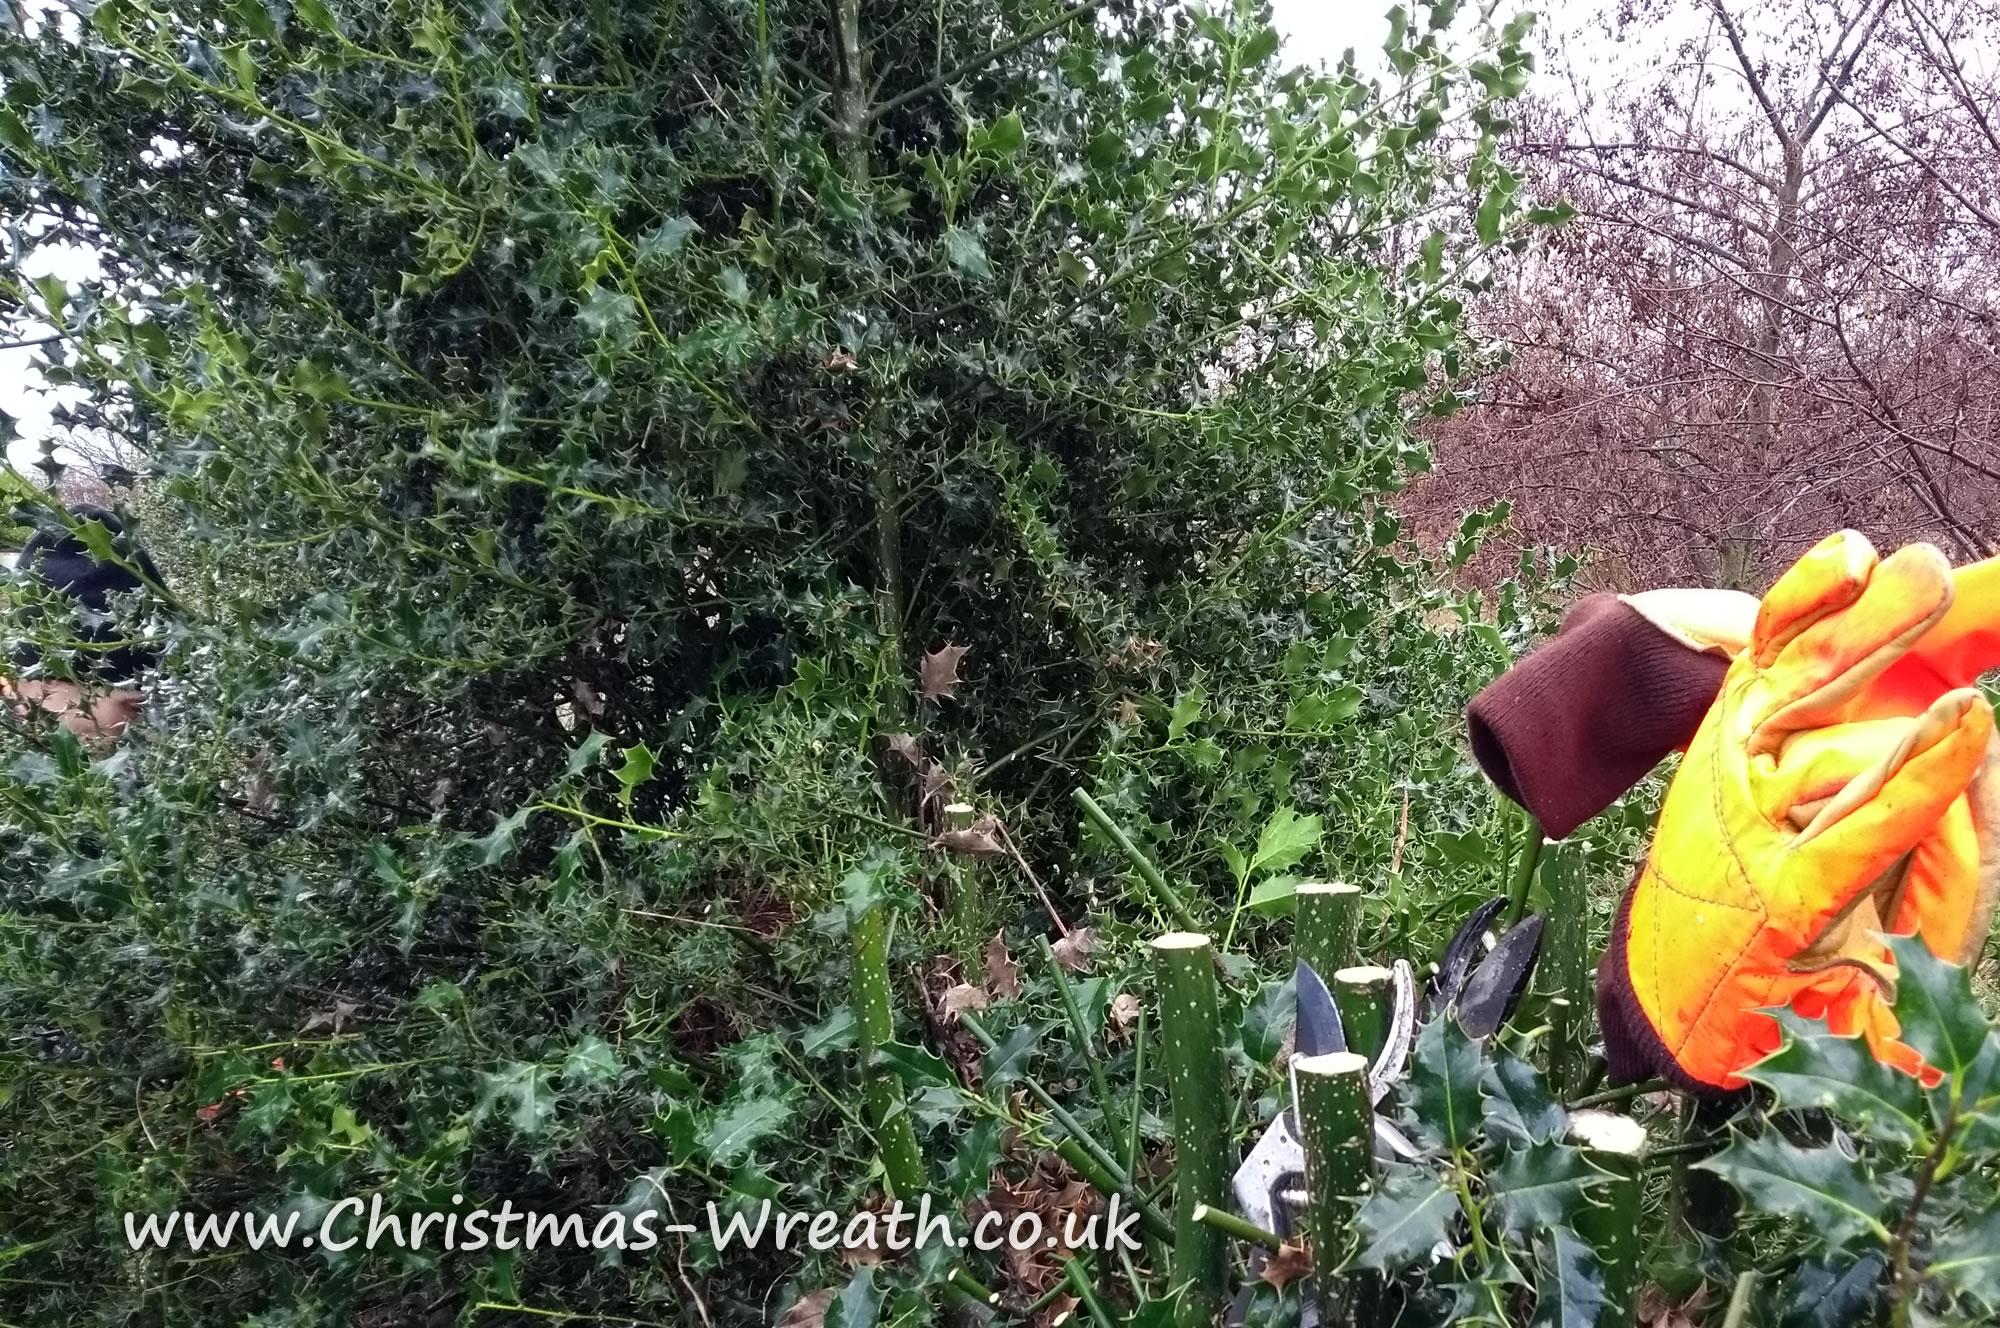 Harvesting Holly